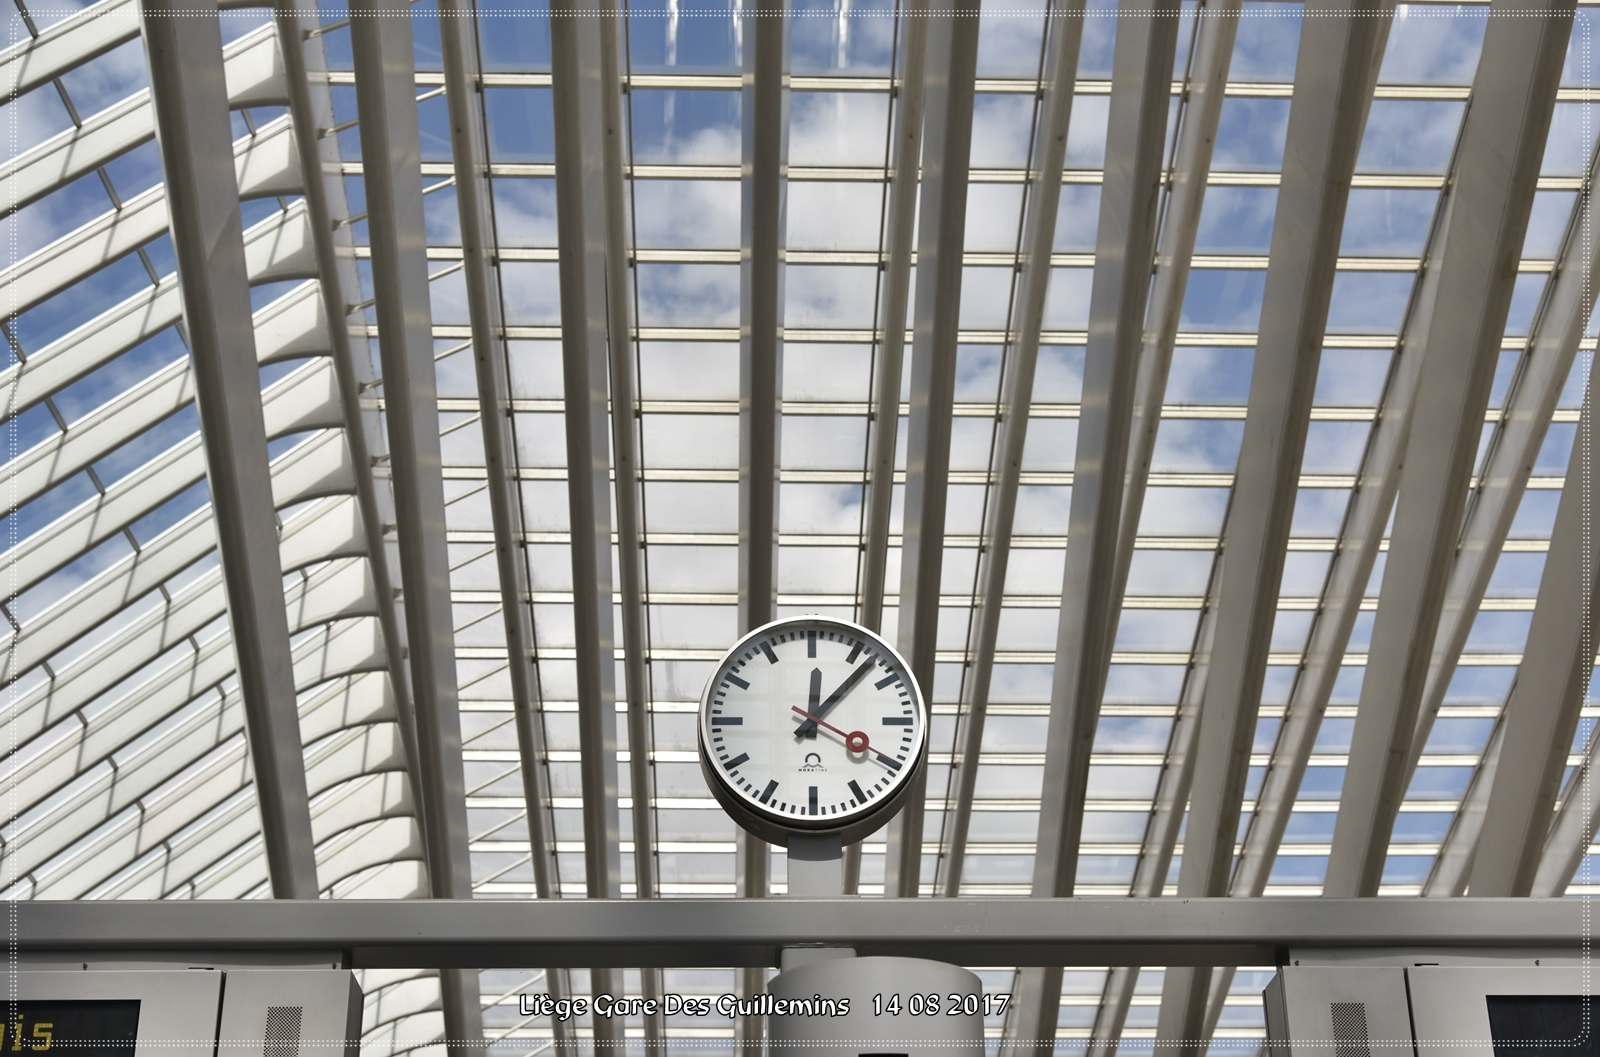 gare des guillemins8 Liege Guillemins Railway Station by Santiago Calatrava